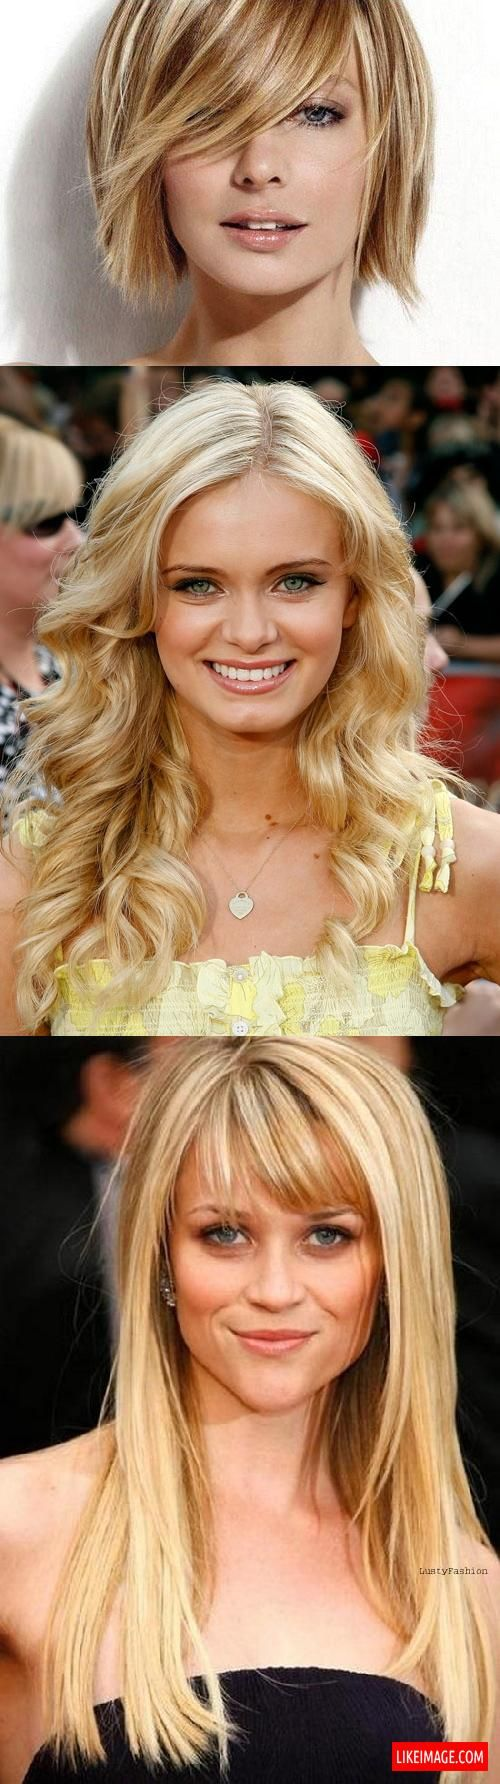 Blonde hairstyles - 8 PHOTO!